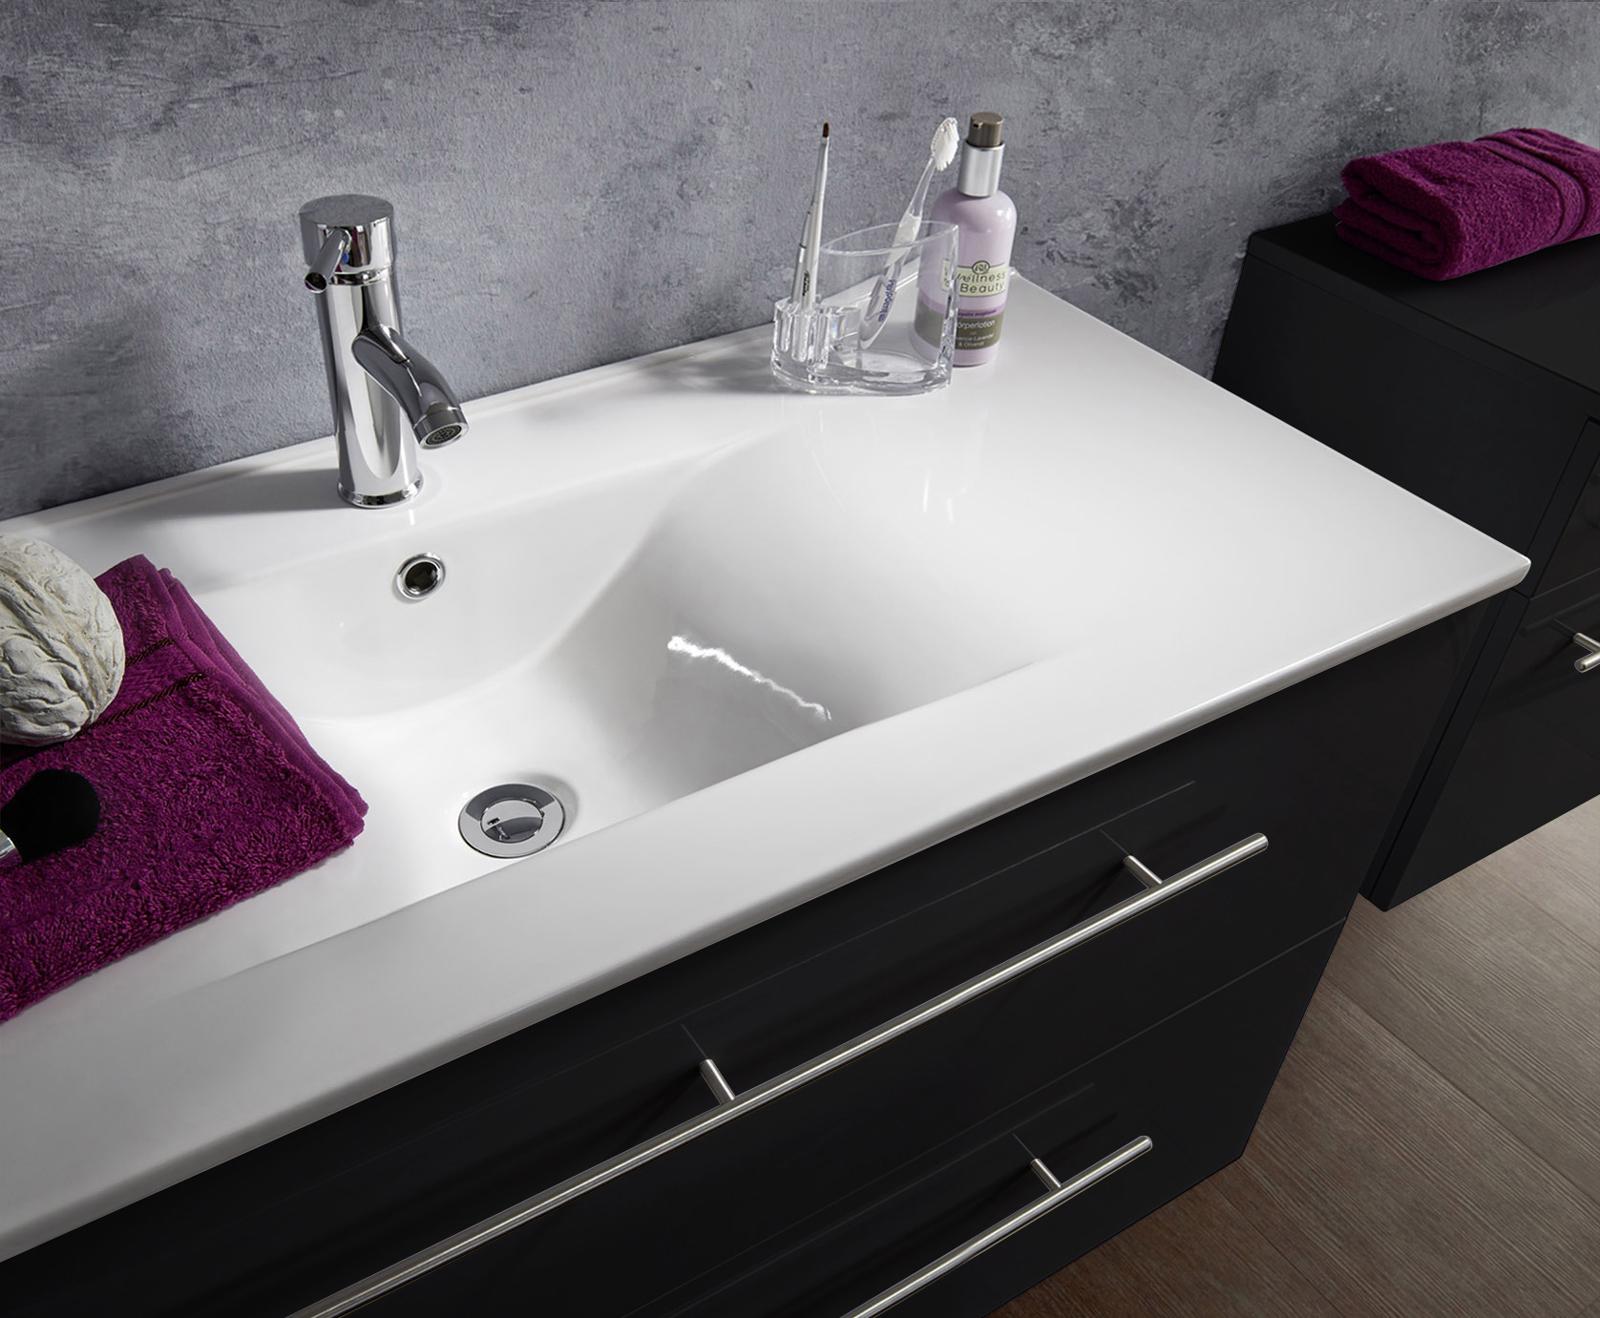 sam 5tlg badezimmer set spiegelschrank schwarz 90 cm verena auf lager. Black Bedroom Furniture Sets. Home Design Ideas